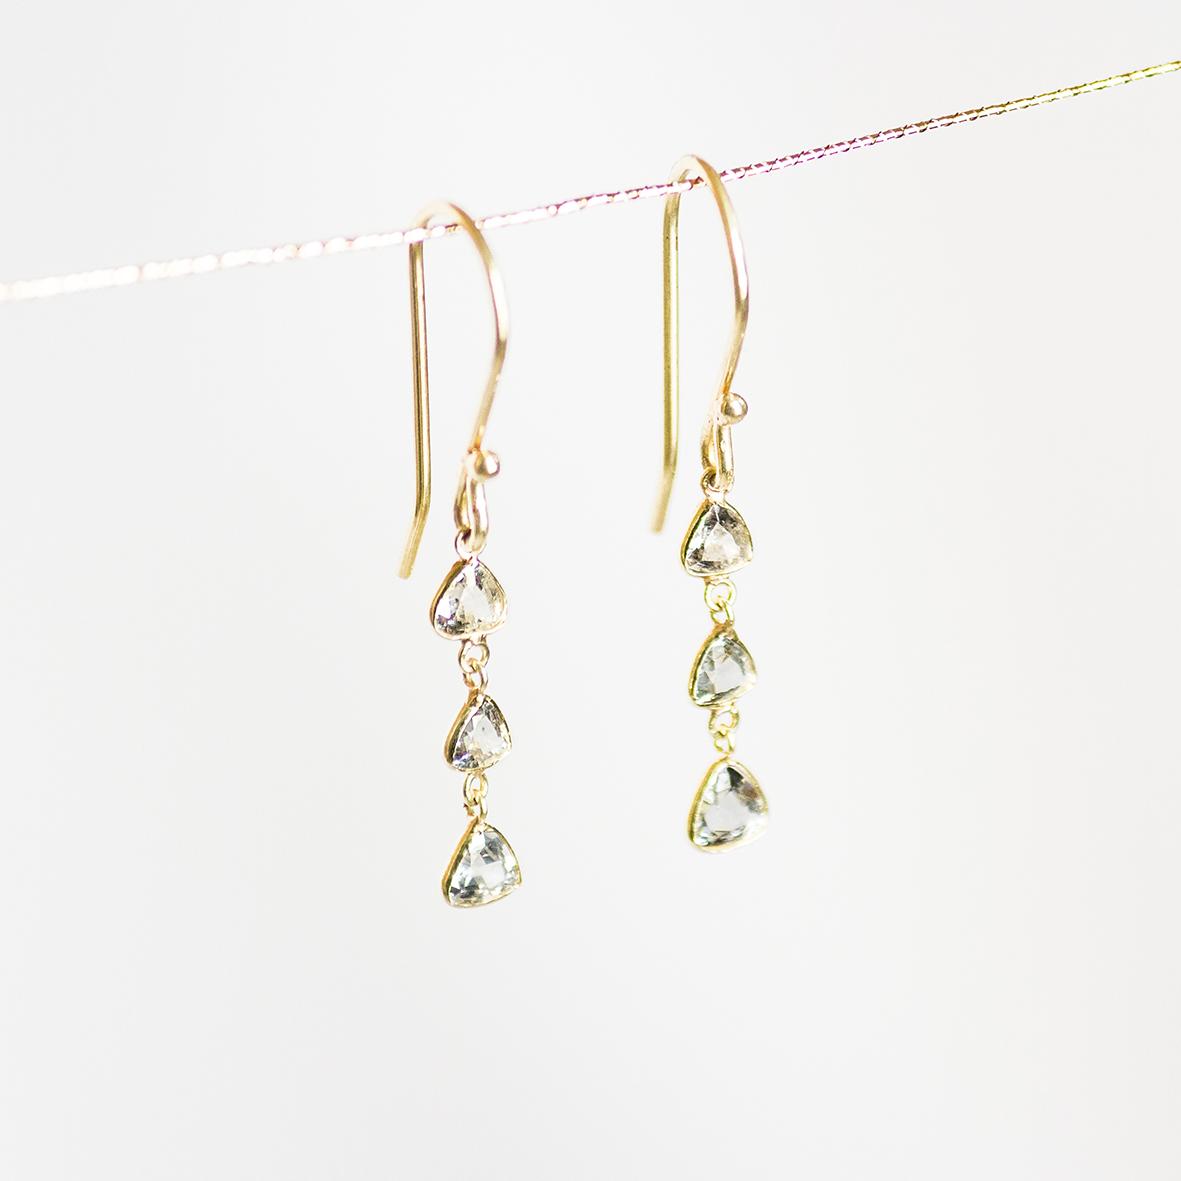 1. OONA_philo_principal_sapphire triangle long earrings